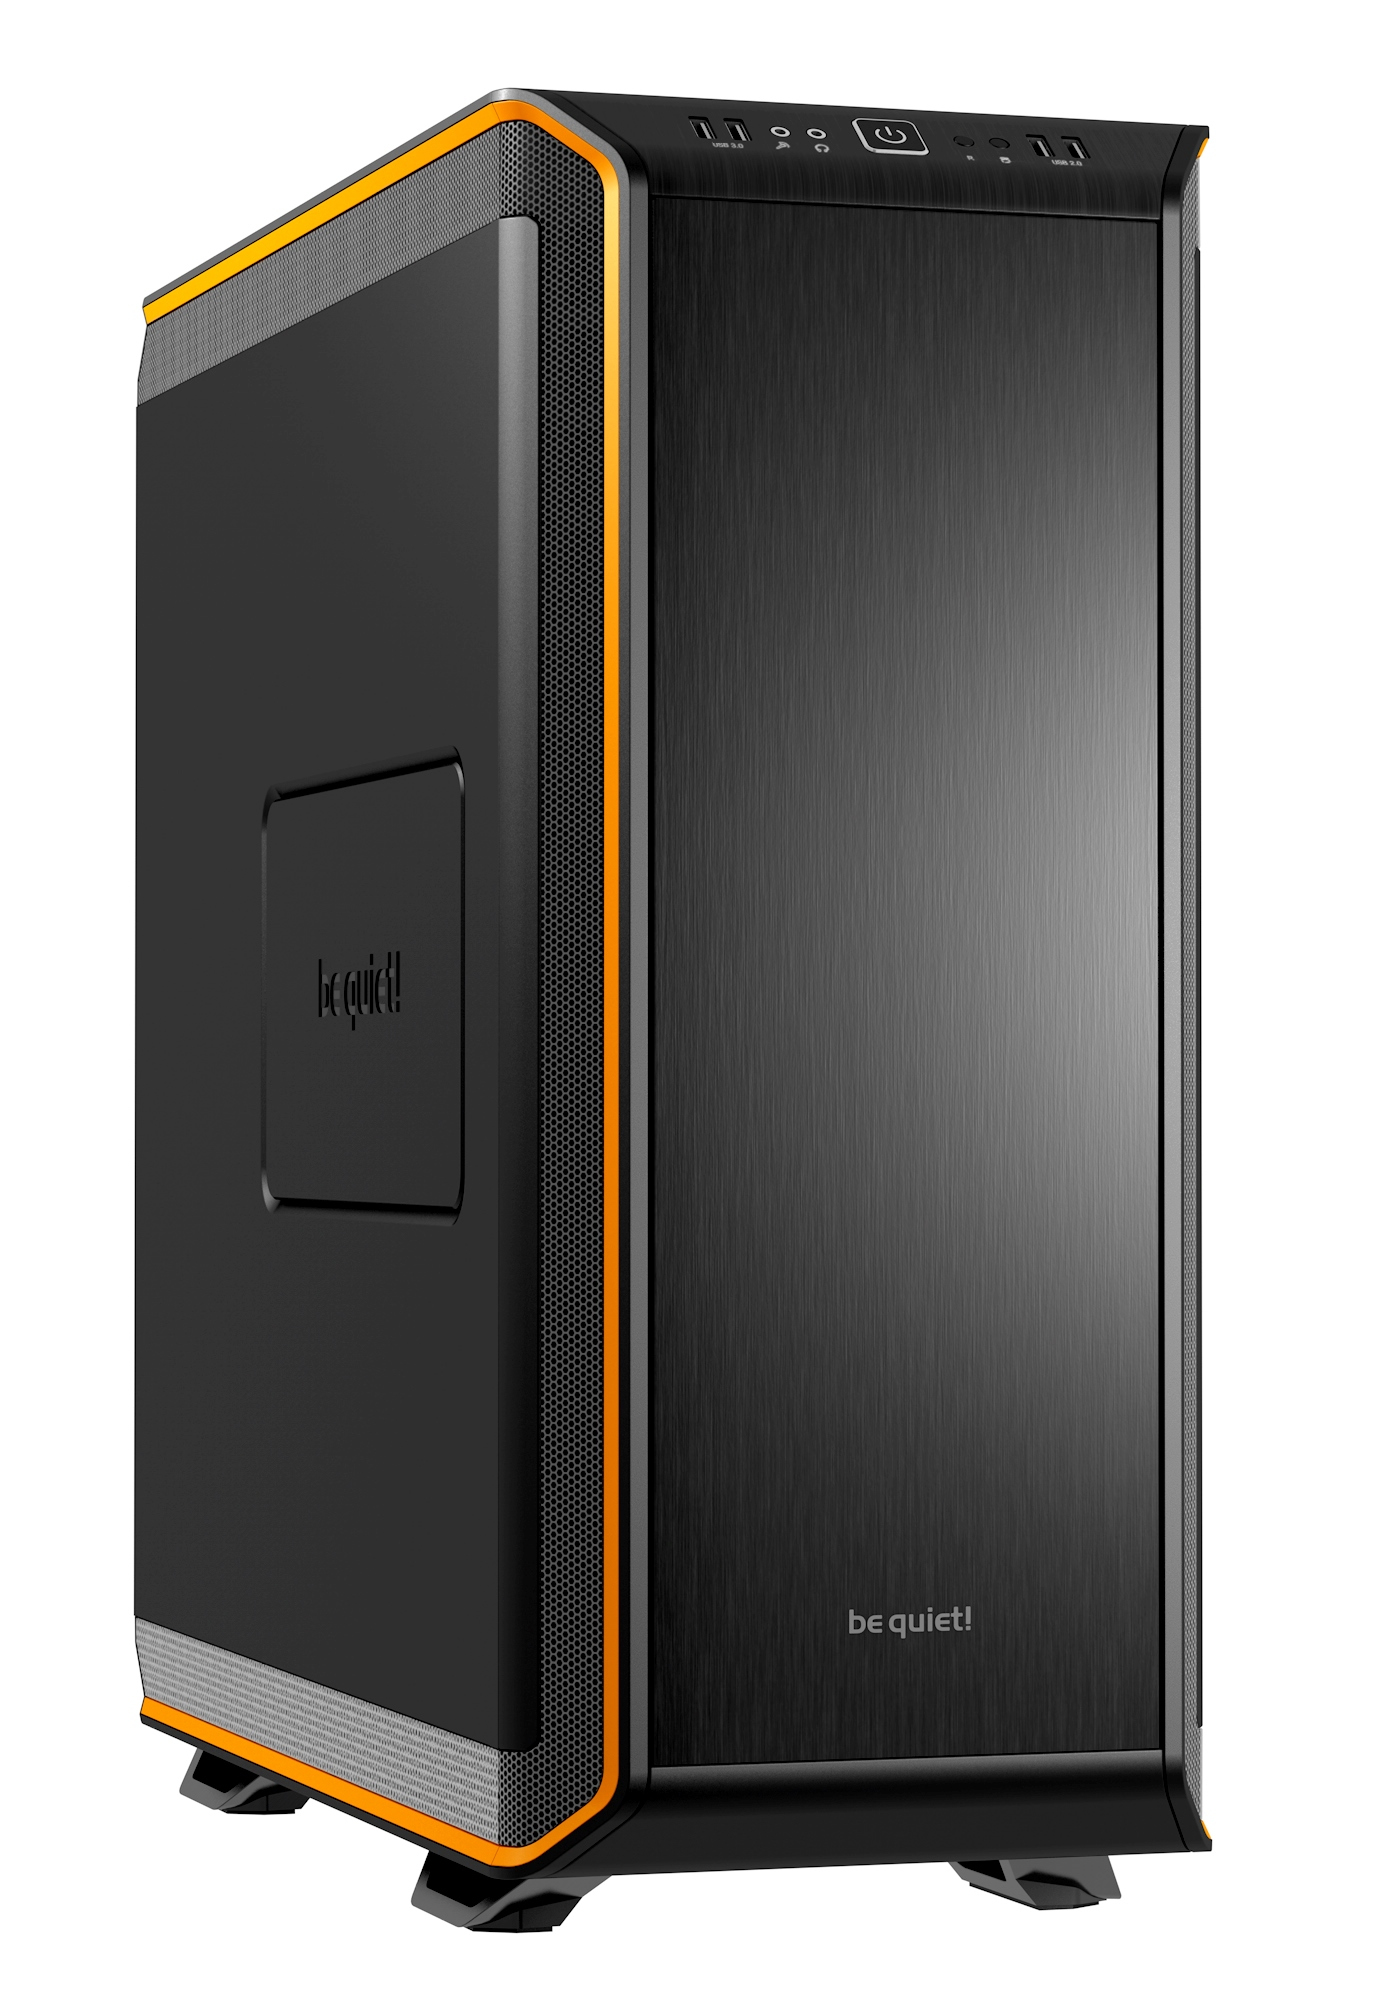 be quiet! Dark Base 900 Orange, 577 x 243 x 585, IO-panel 2x USB 3.0, 2x USB 2.0, HD Audio, 2x 5,25, 7x 3,5, 15x 2,5, inc 3x 140 mm, tripple air channel cooling, 2-in-1 airintake sidepanel, Manual fan controoler, 3 x PWM, 3x3pin